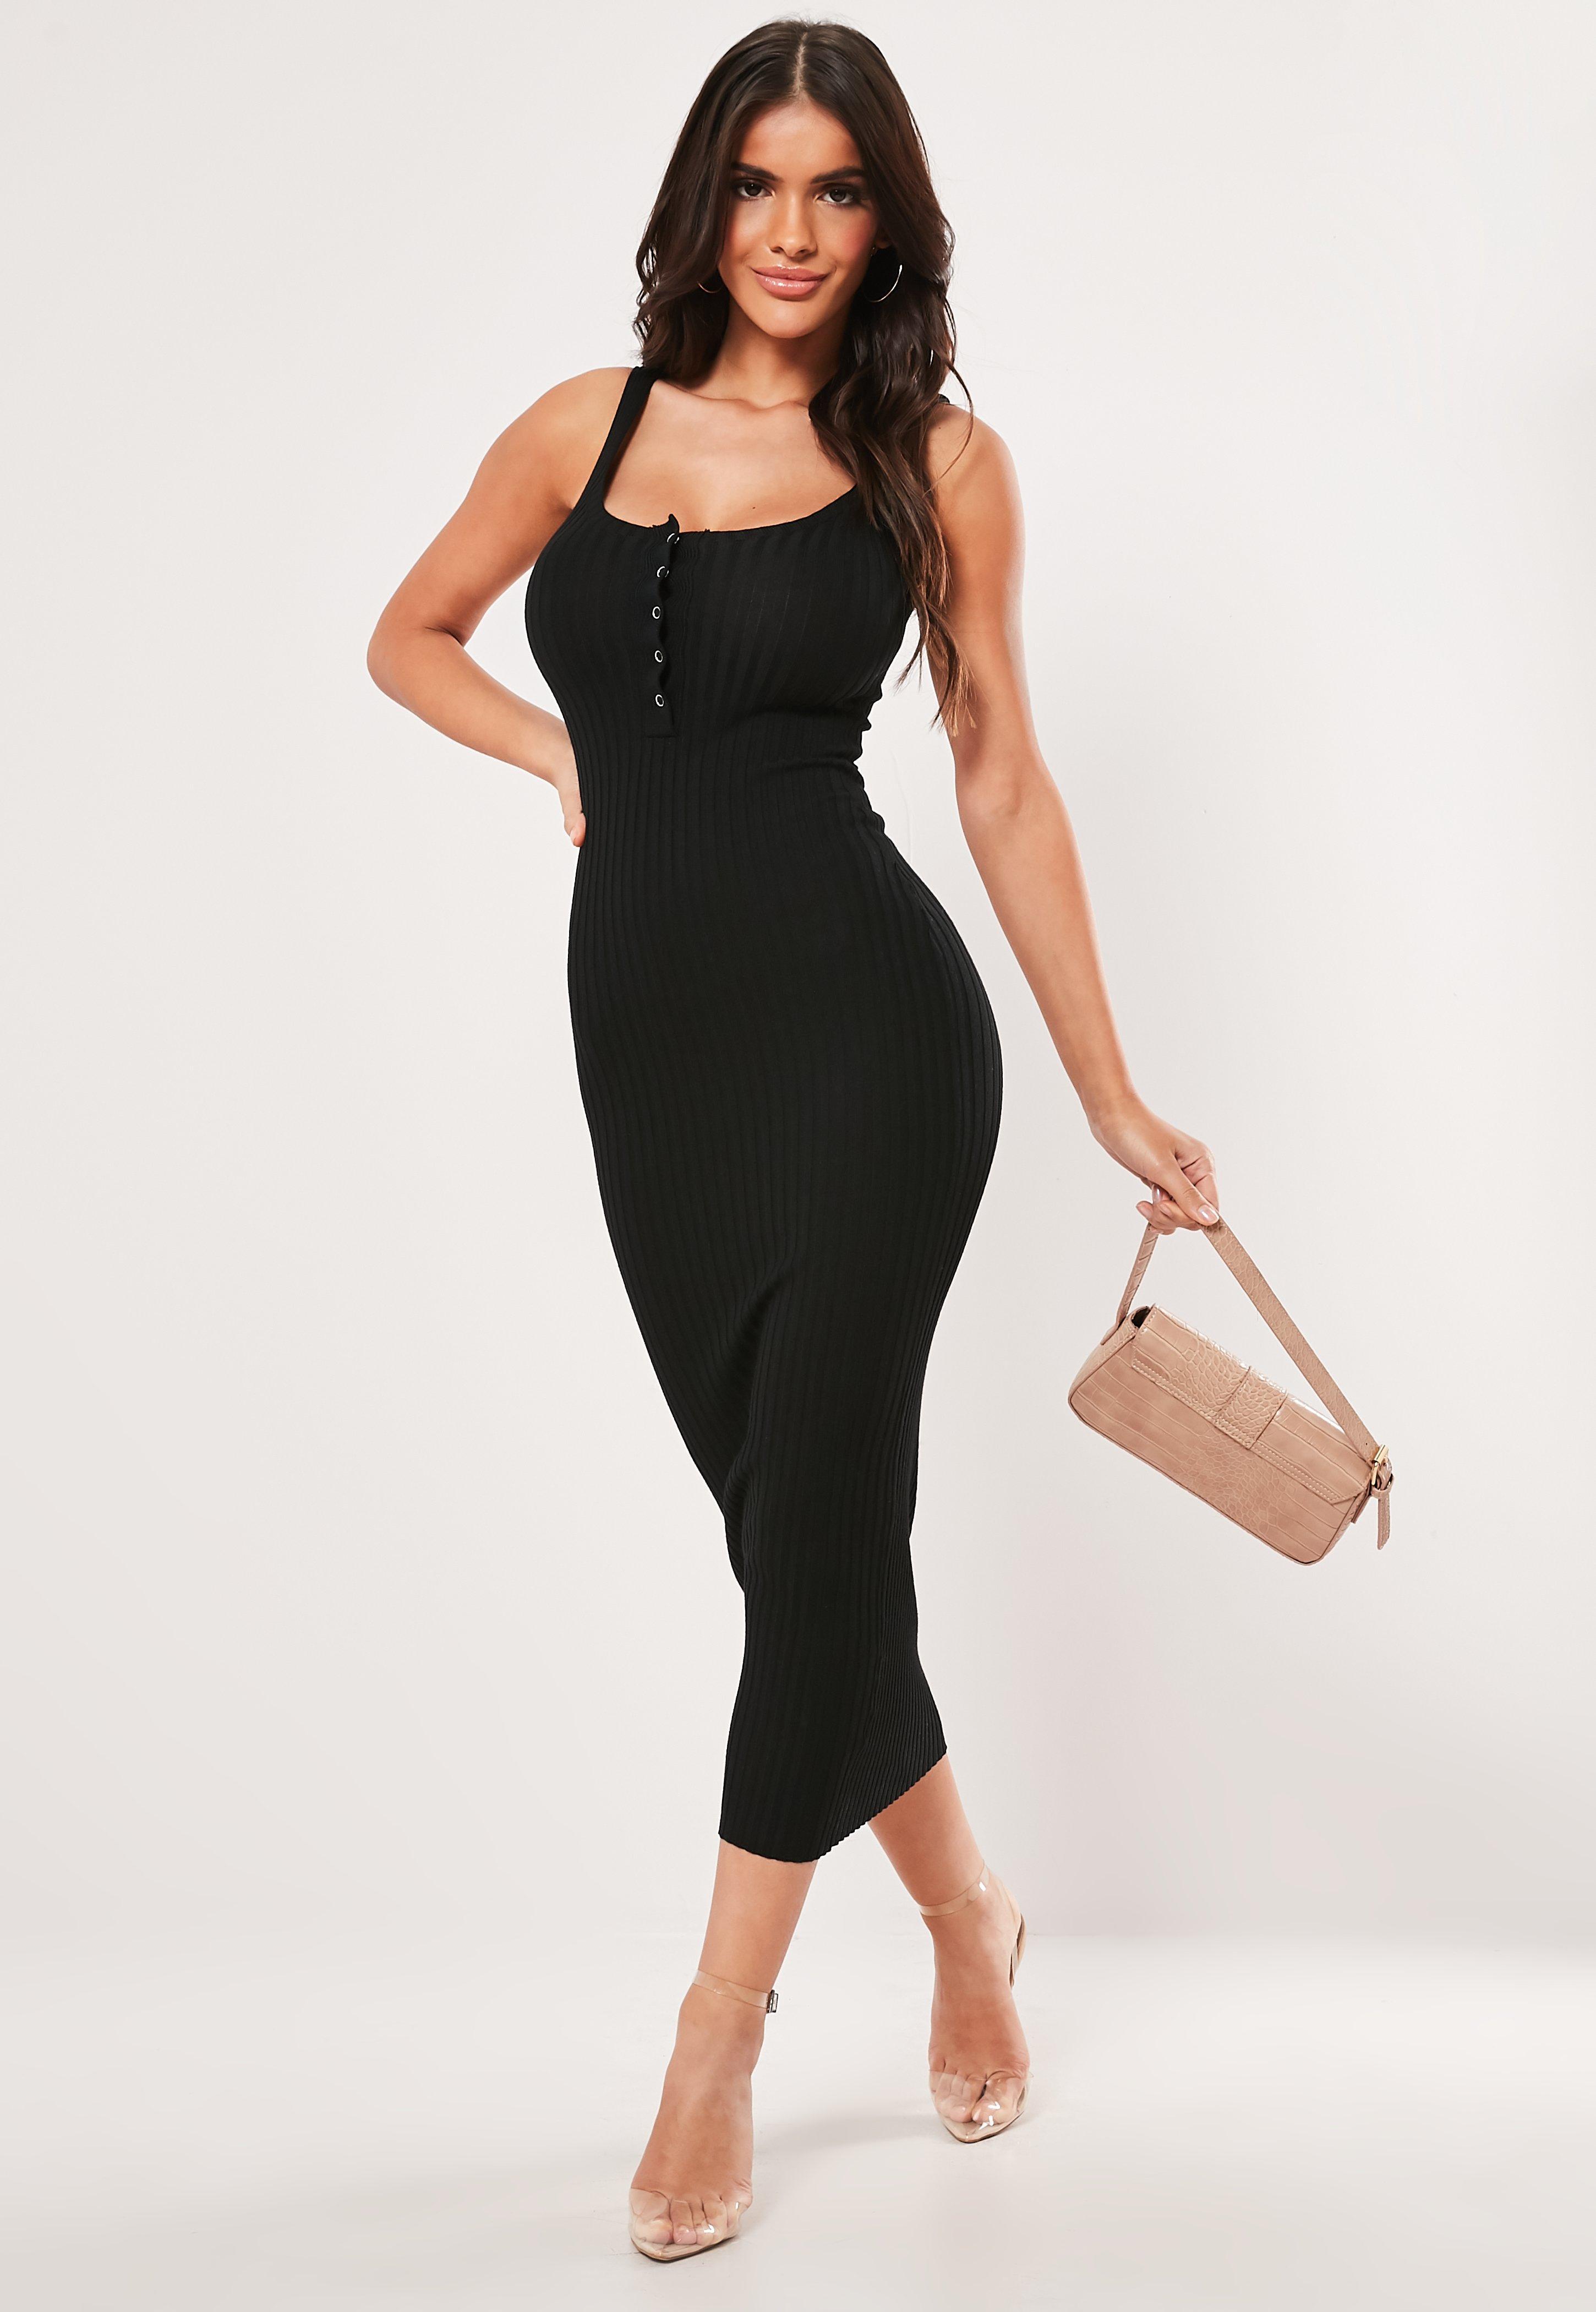 17a1dcd2 Czarna sukienka midaxi z zatrzaskami na dekolcie